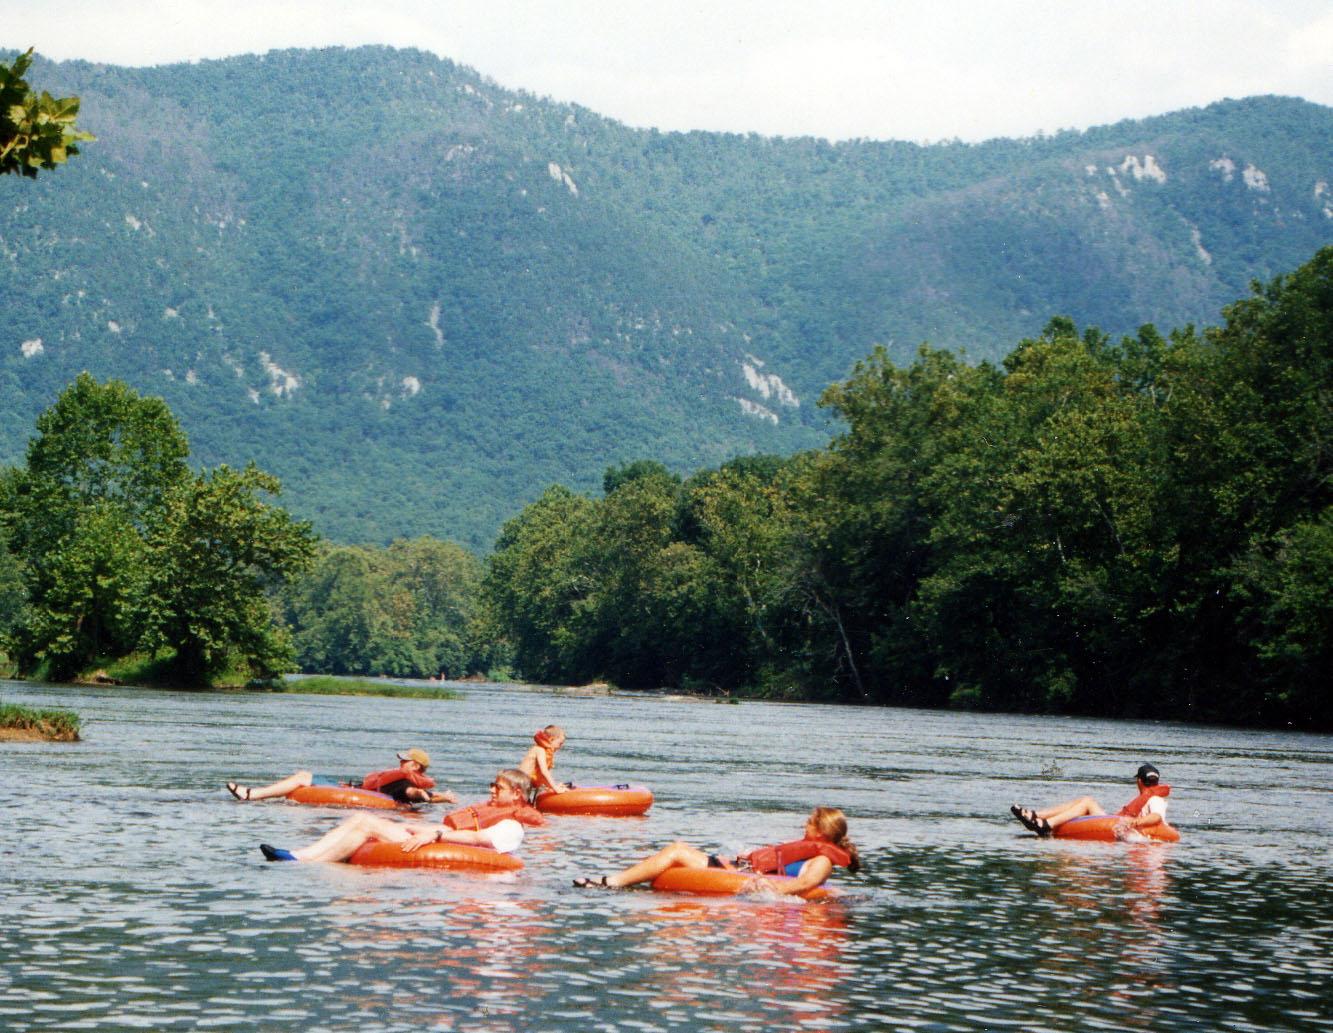 Shenandoah river tubing